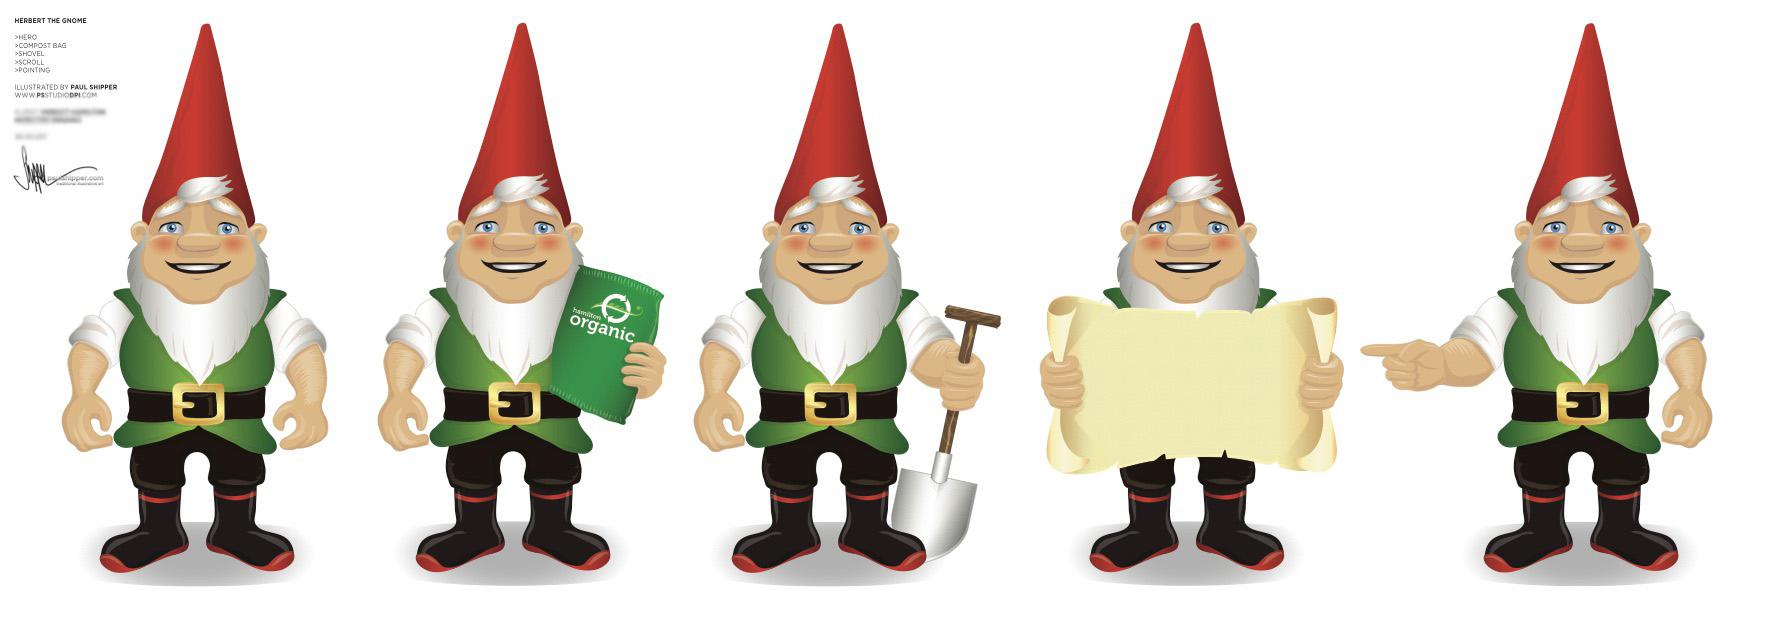 Meet Herbert the Organic Gnome - Hamilton Organic